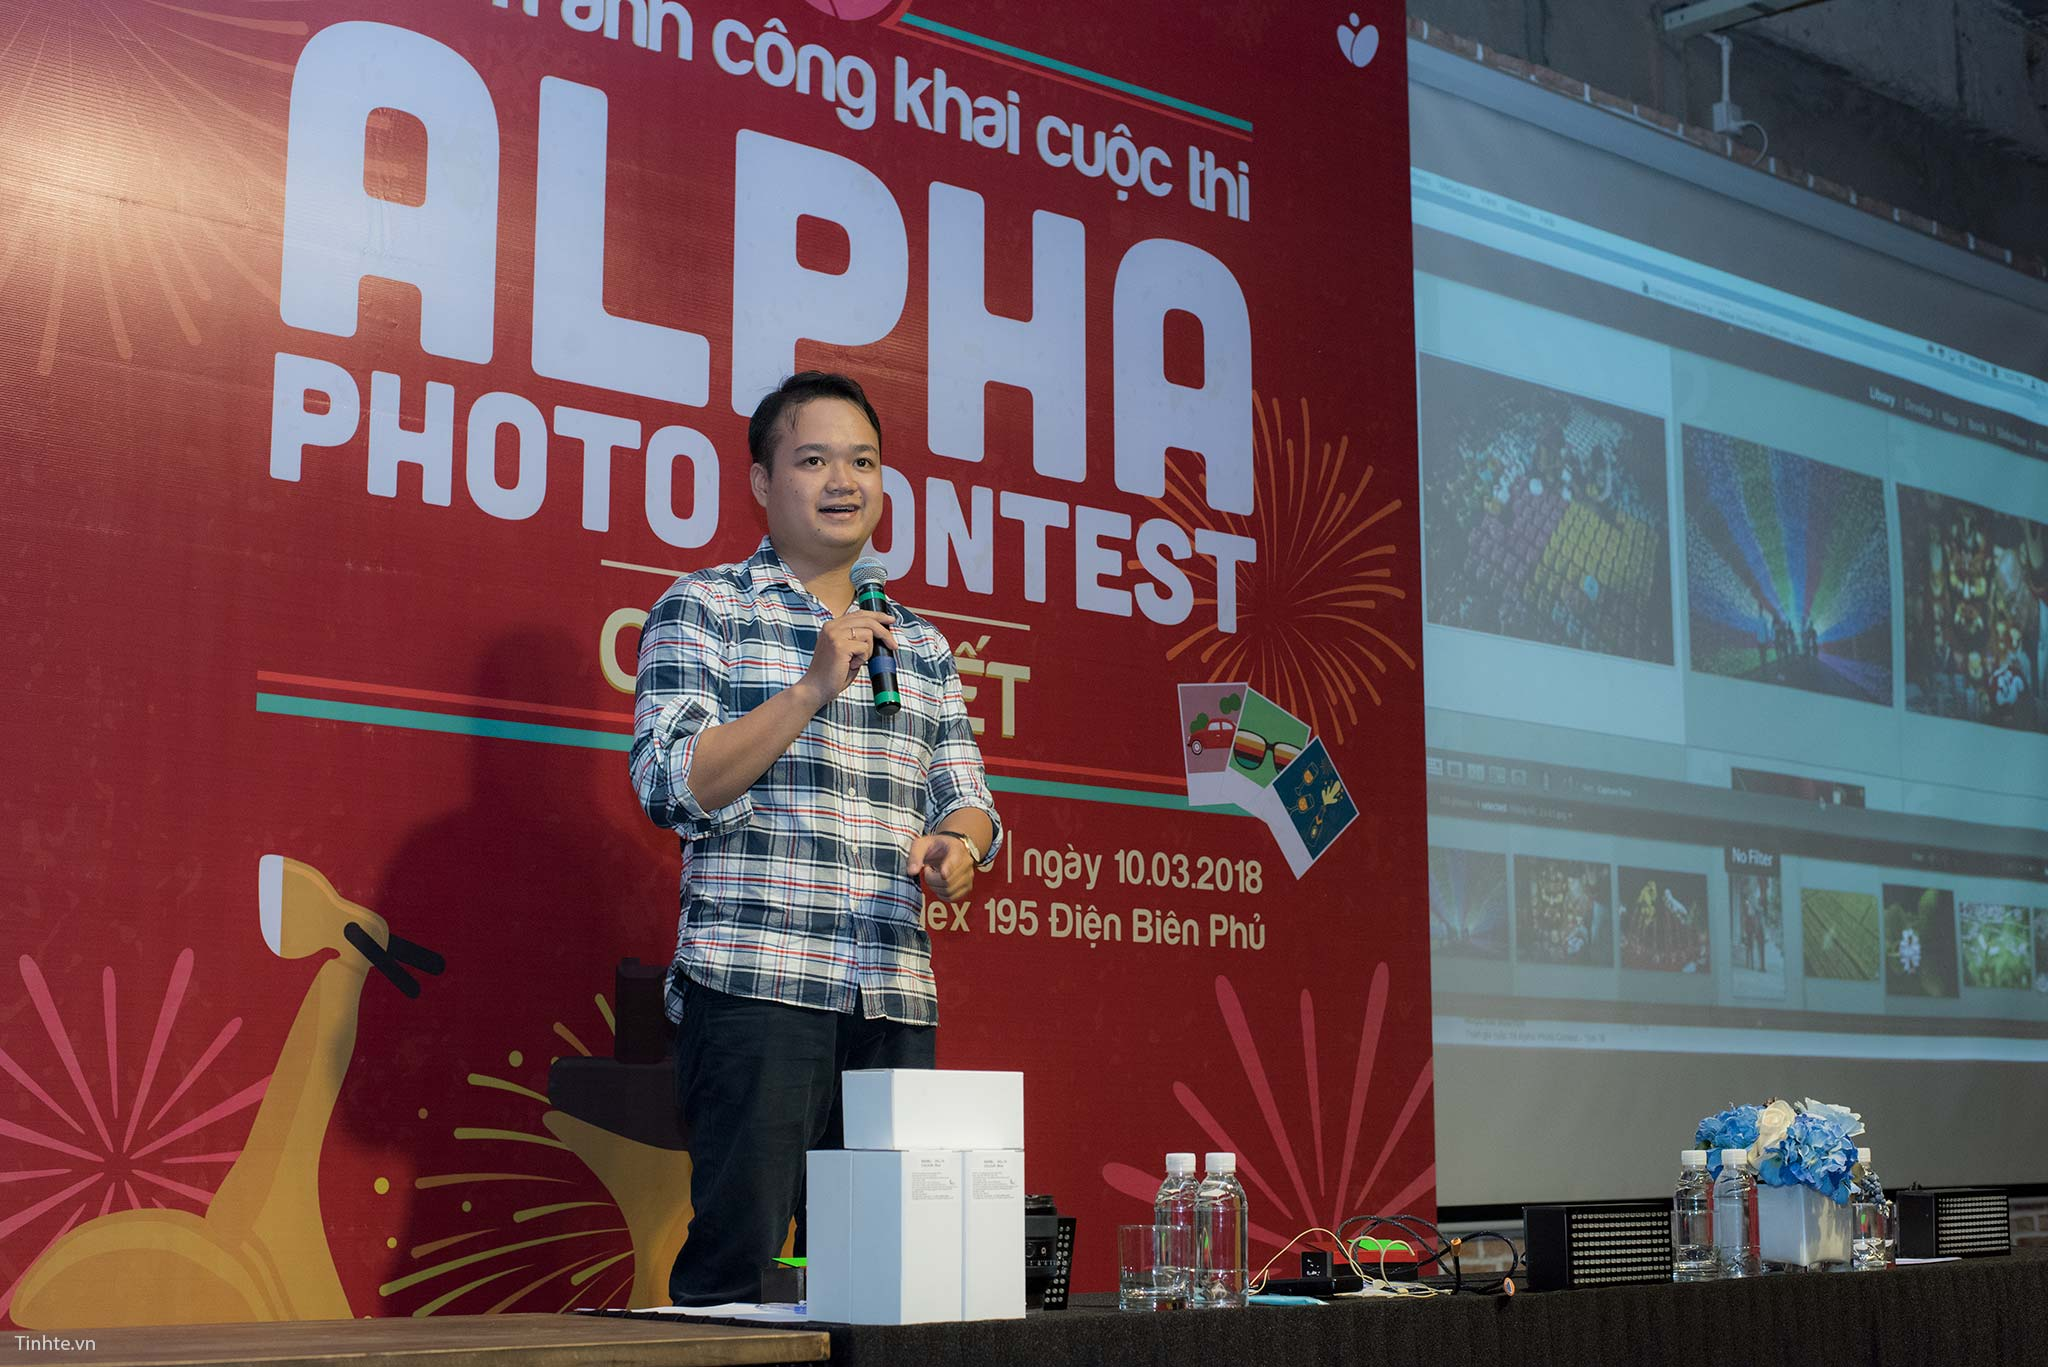 alphaphotocontest-camera.tinhte.vn-30.jpg